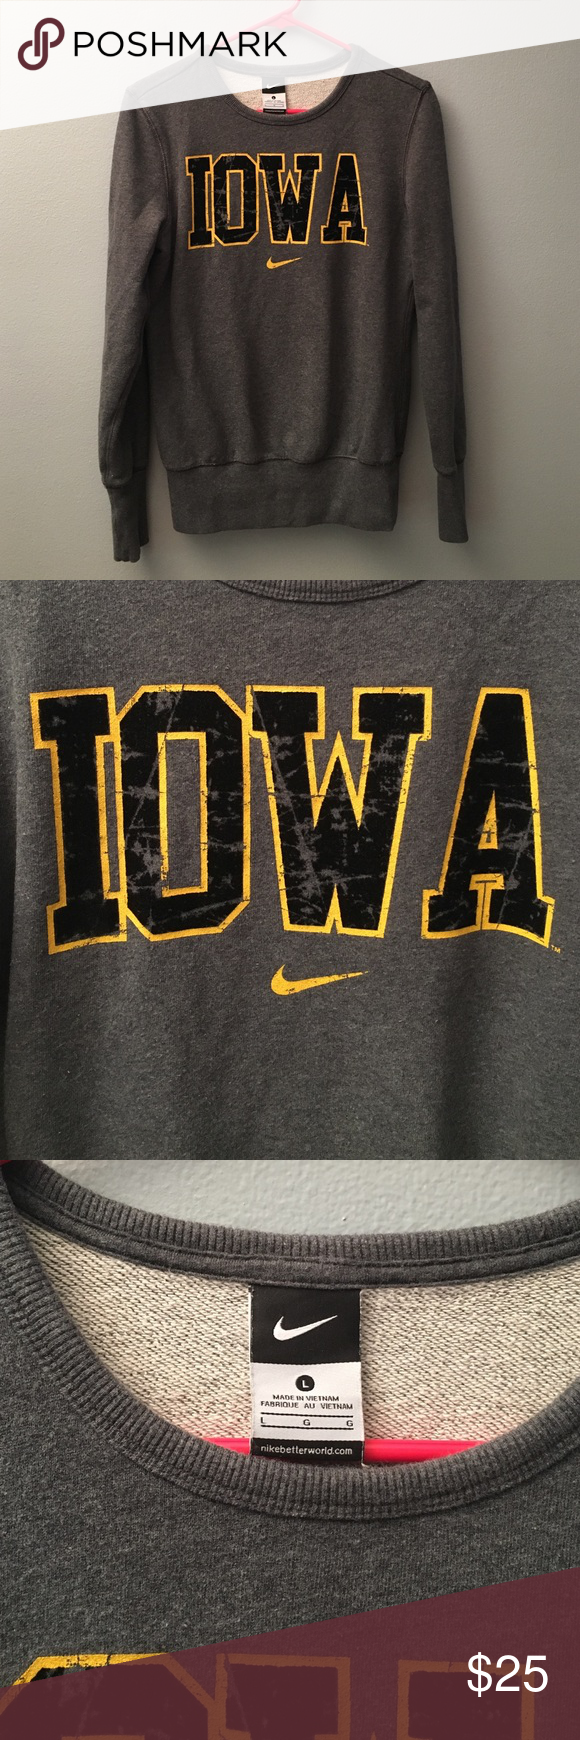 Iowa Hawkeyes Sweatshirt Sweatshirts Iowa Hawkeyes Iowa [ 1740 x 580 Pixel ]